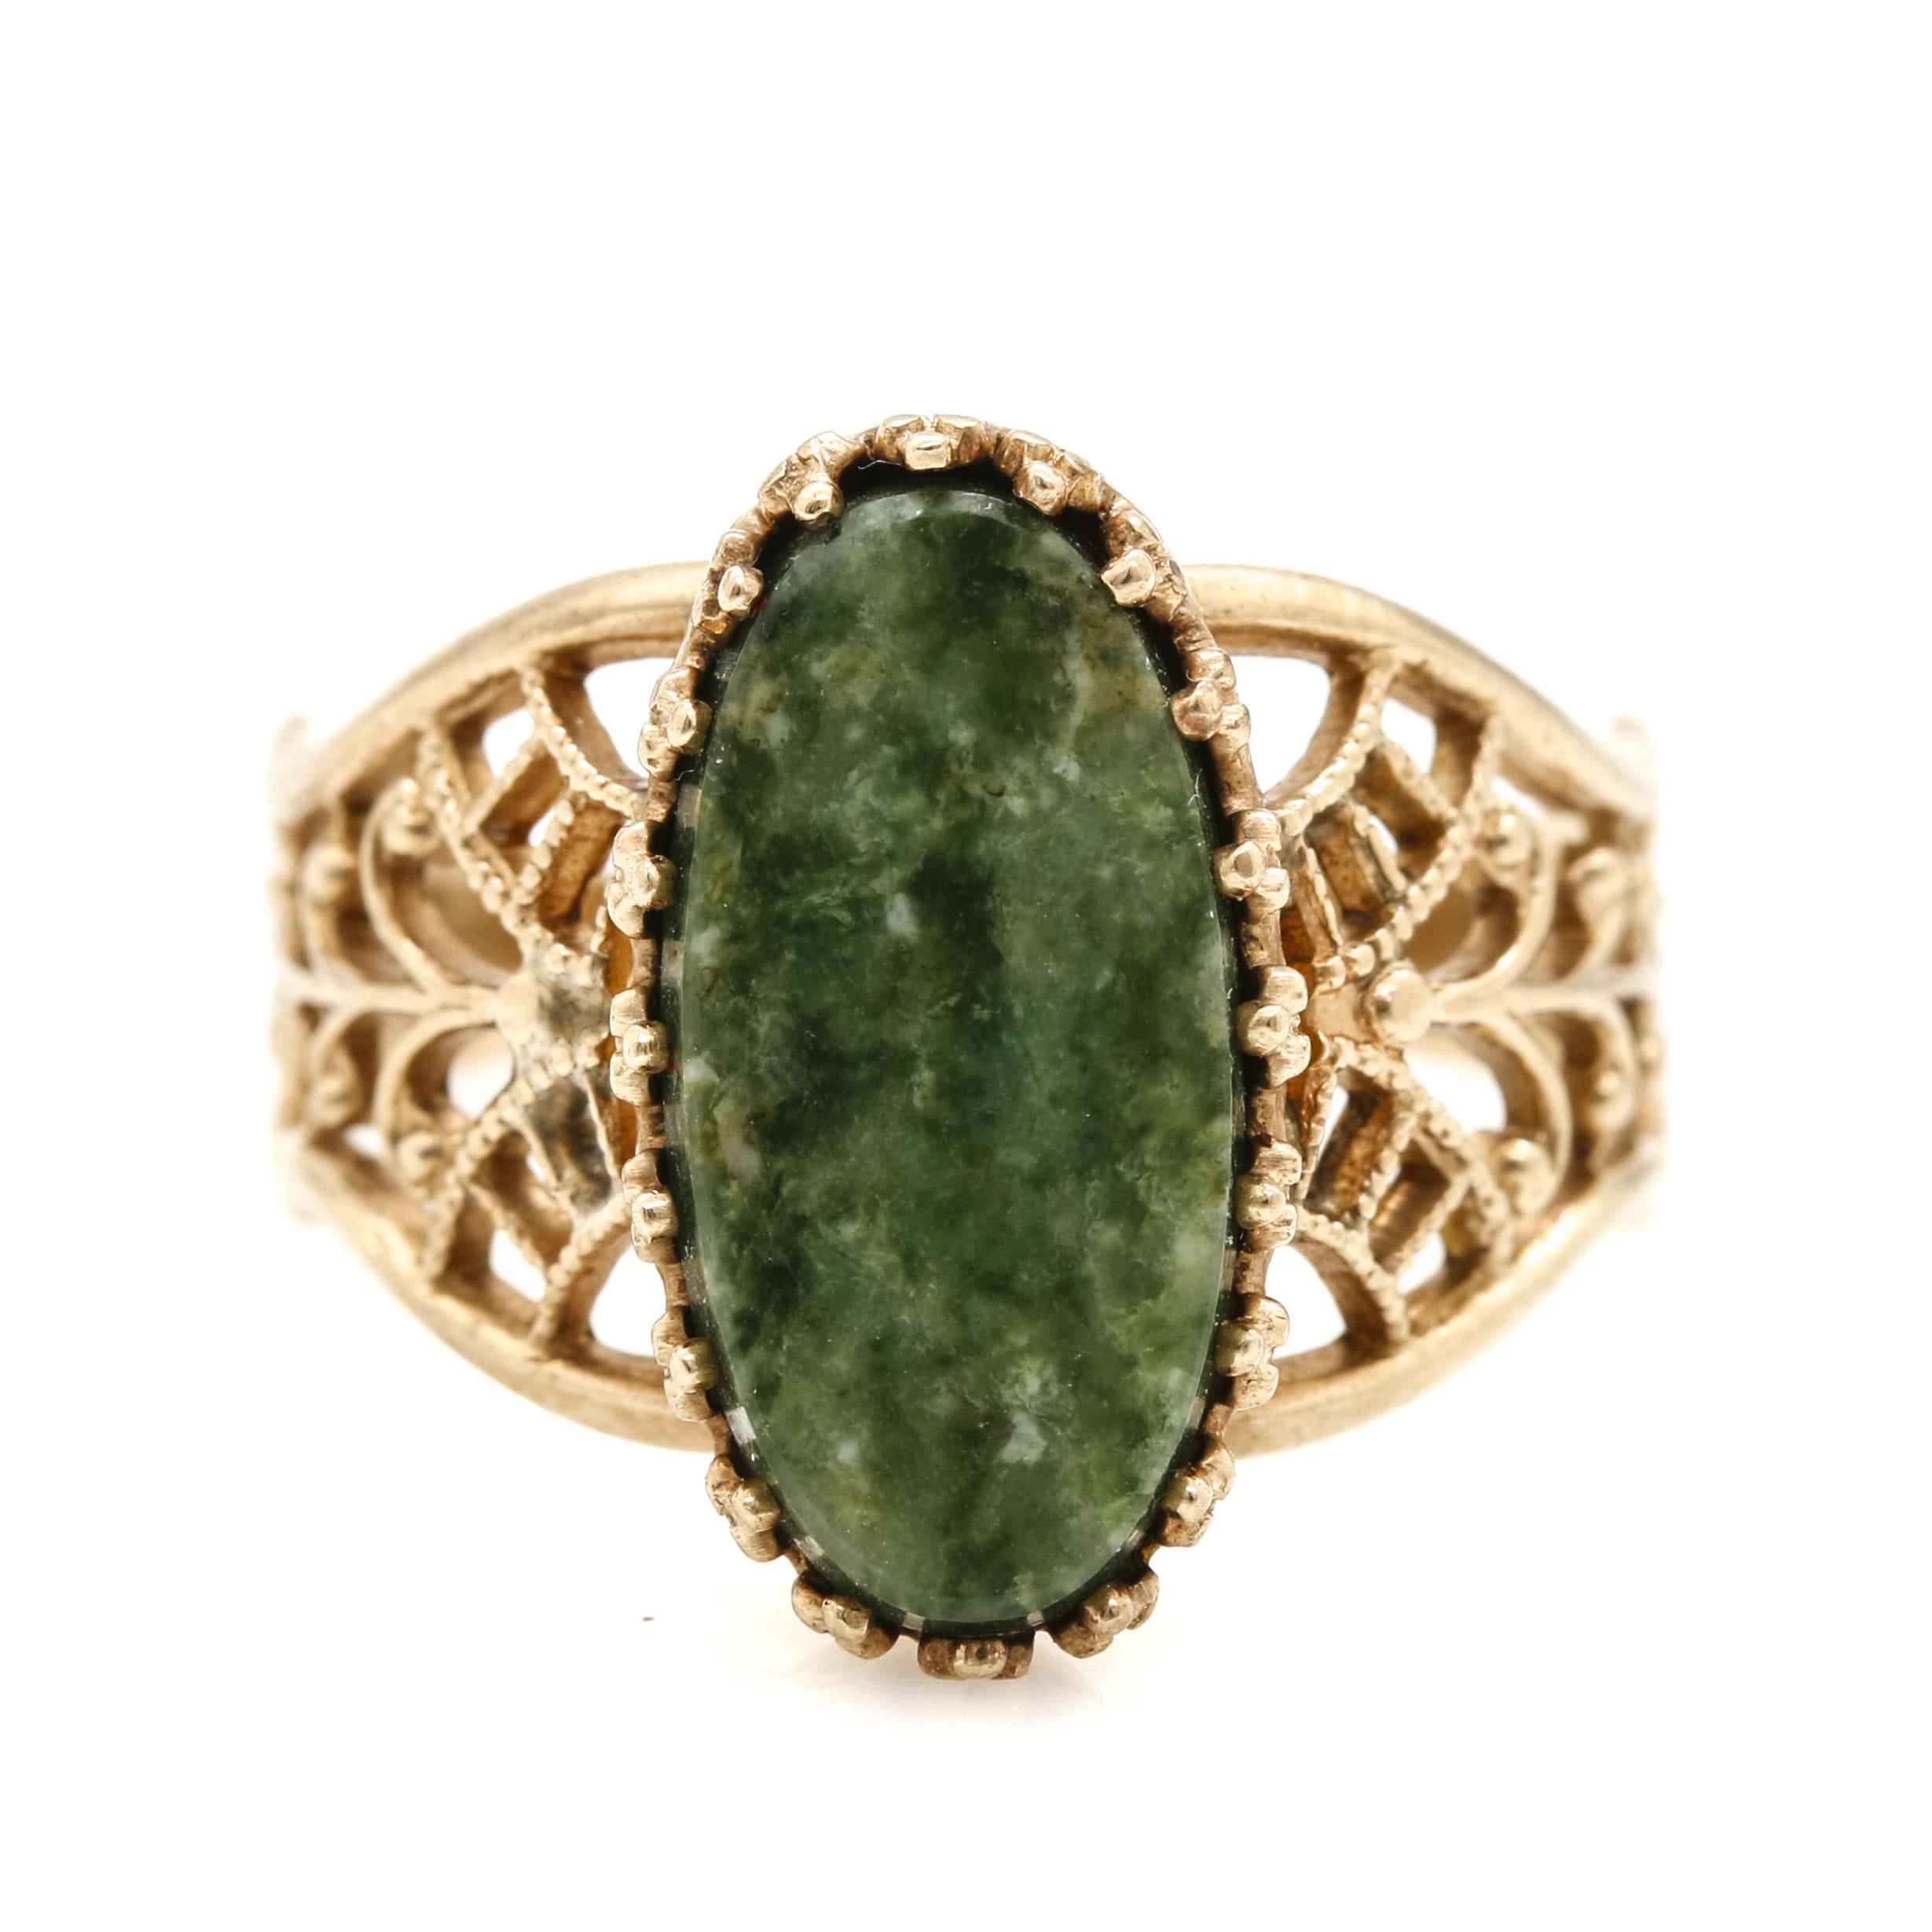 10K Yellow Gold Serpentine Foliate Ring